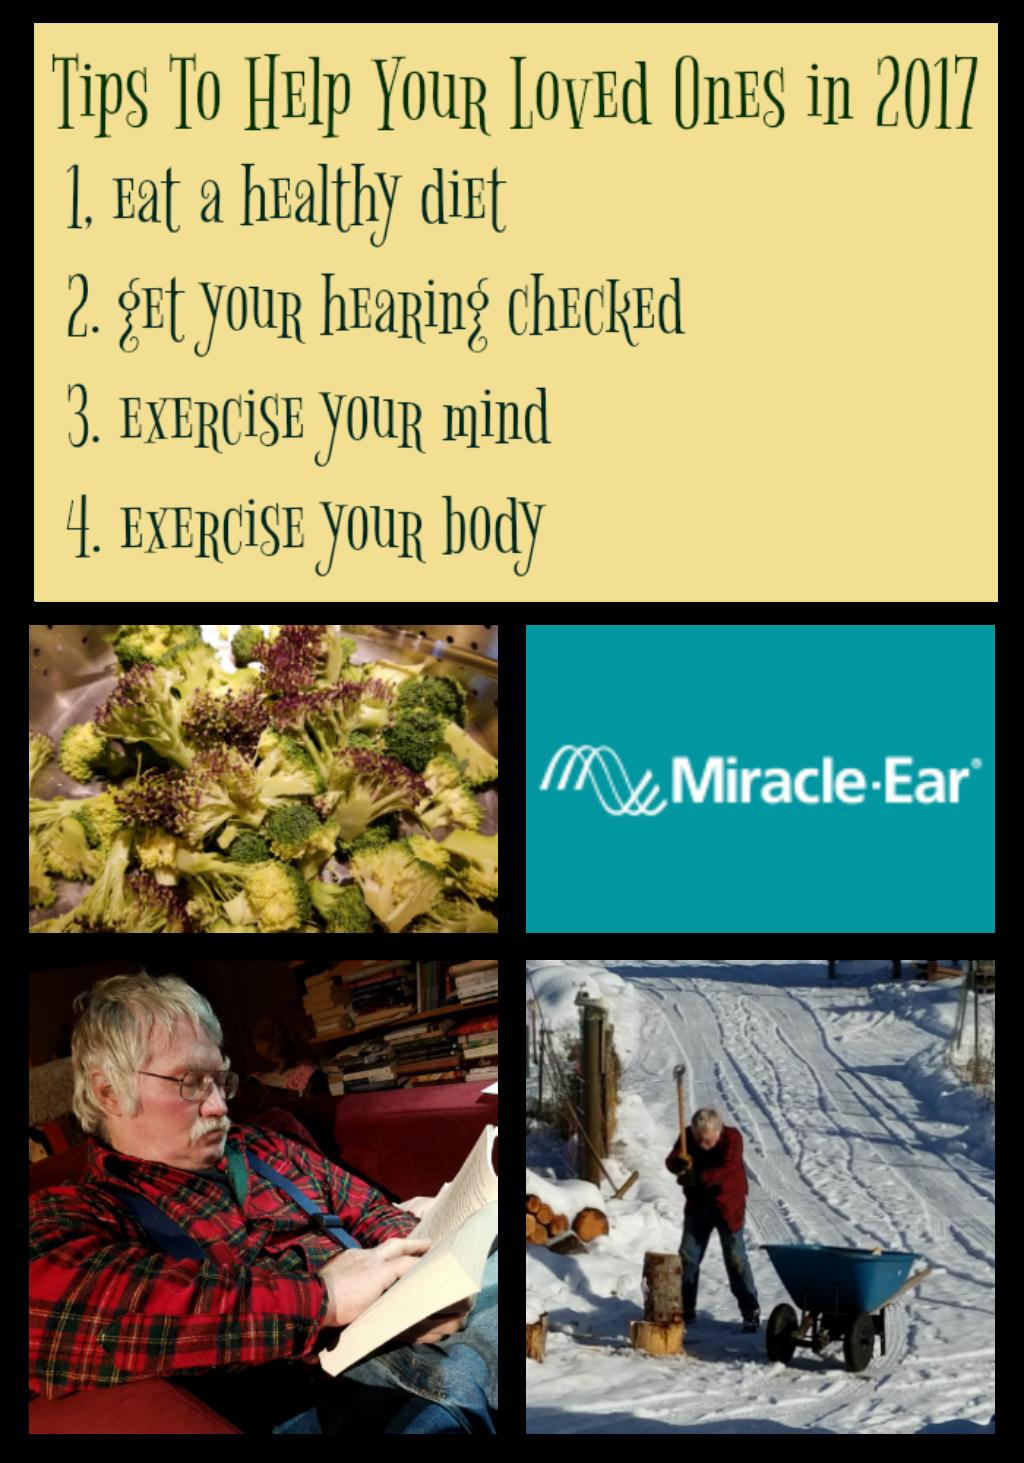 Miracle-Ear, Improve Hearing, #HearABetterDay, #AD